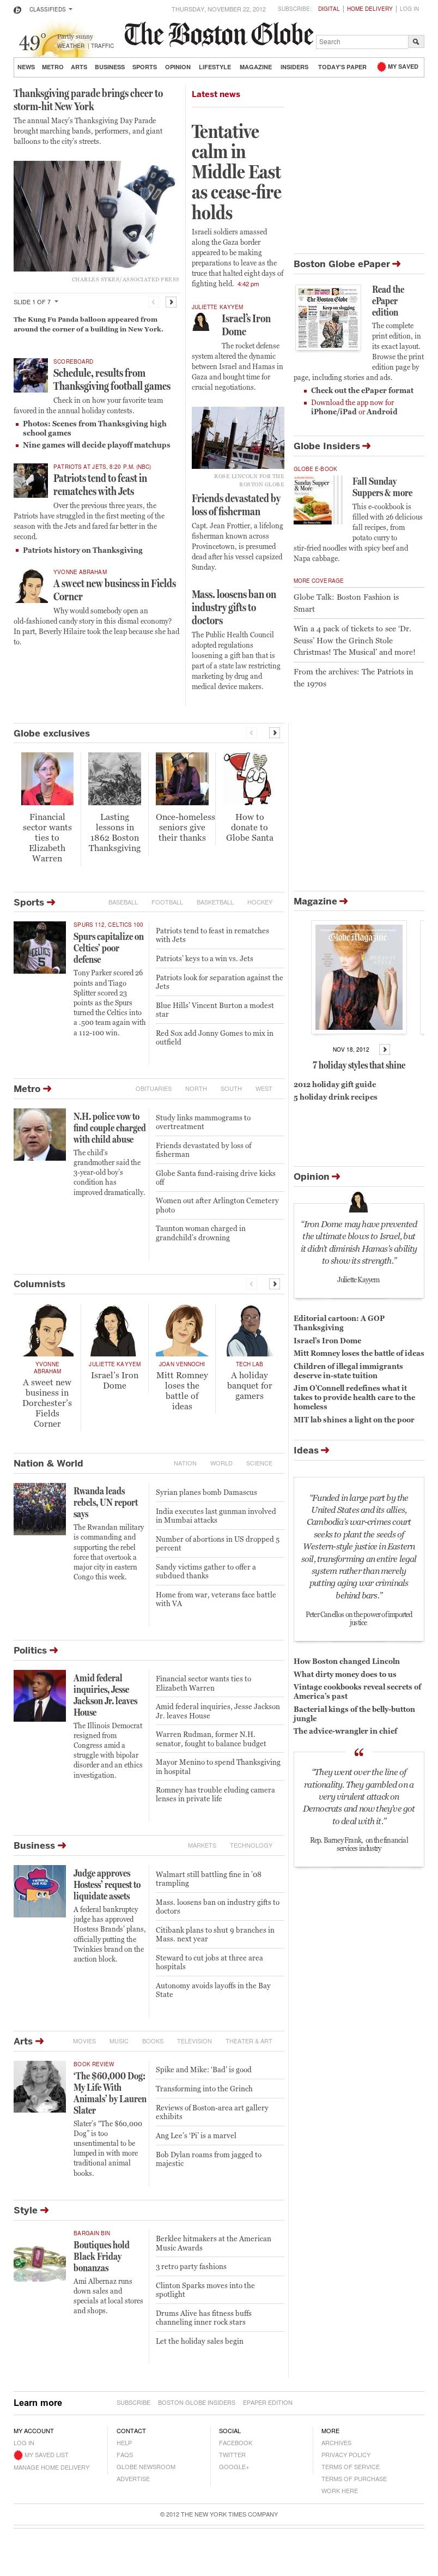 The Boston Globe at Thursday Nov. 22, 2012, 7:02 p.m. UTC